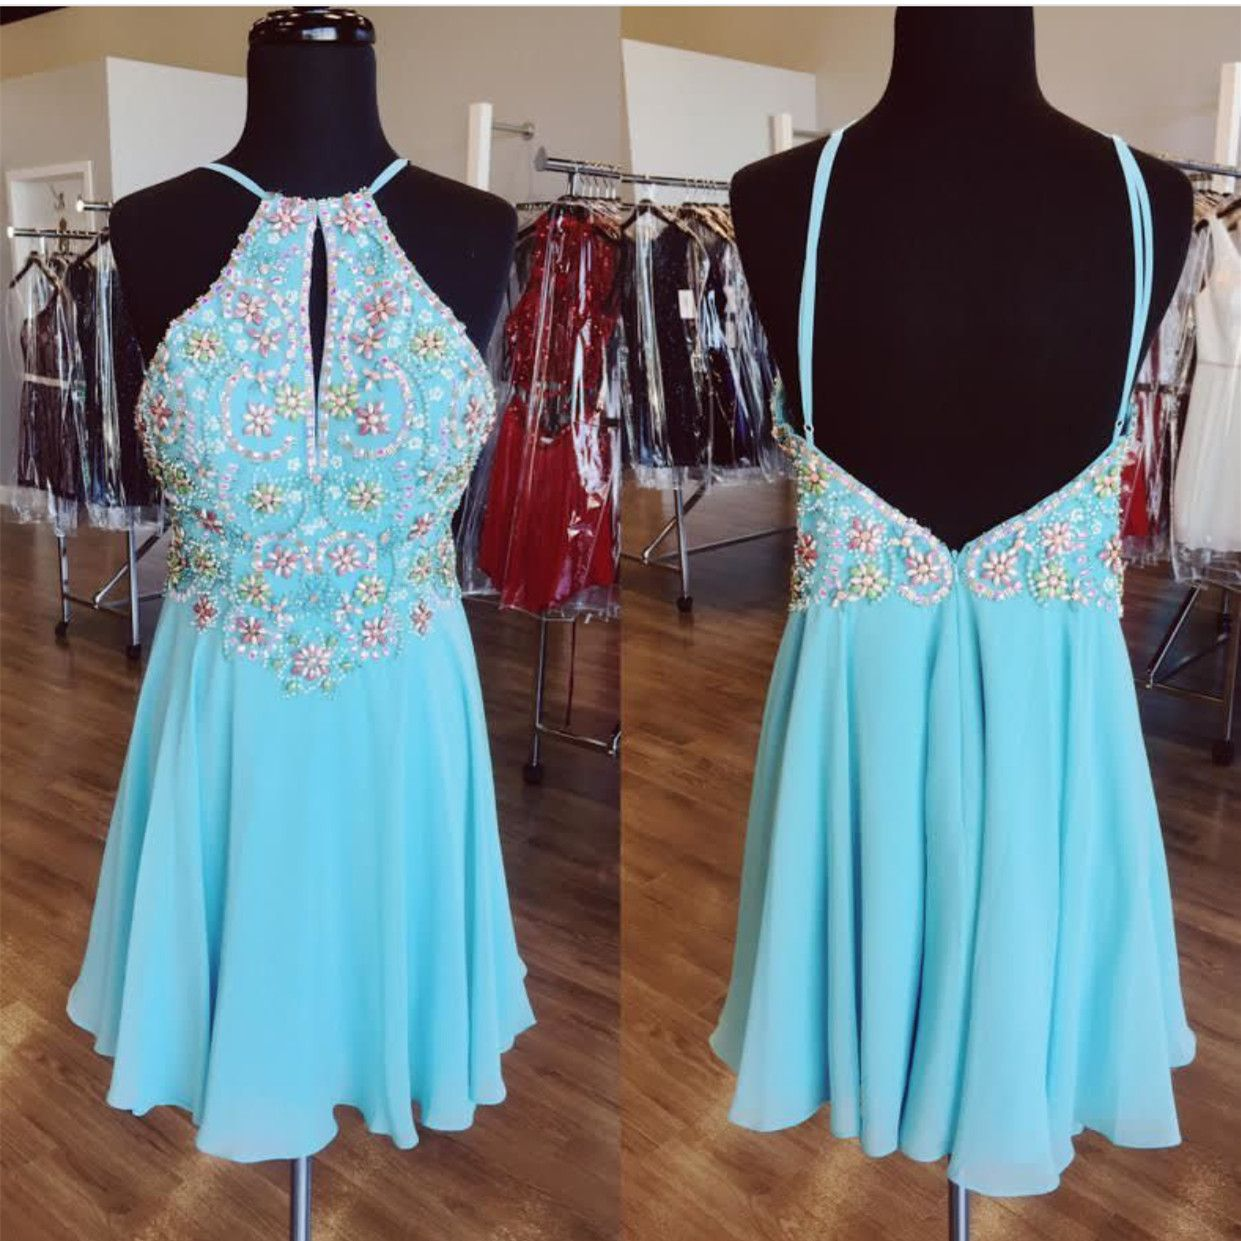 Sexy prom dressblue prom dressopen back cocktail dressshort